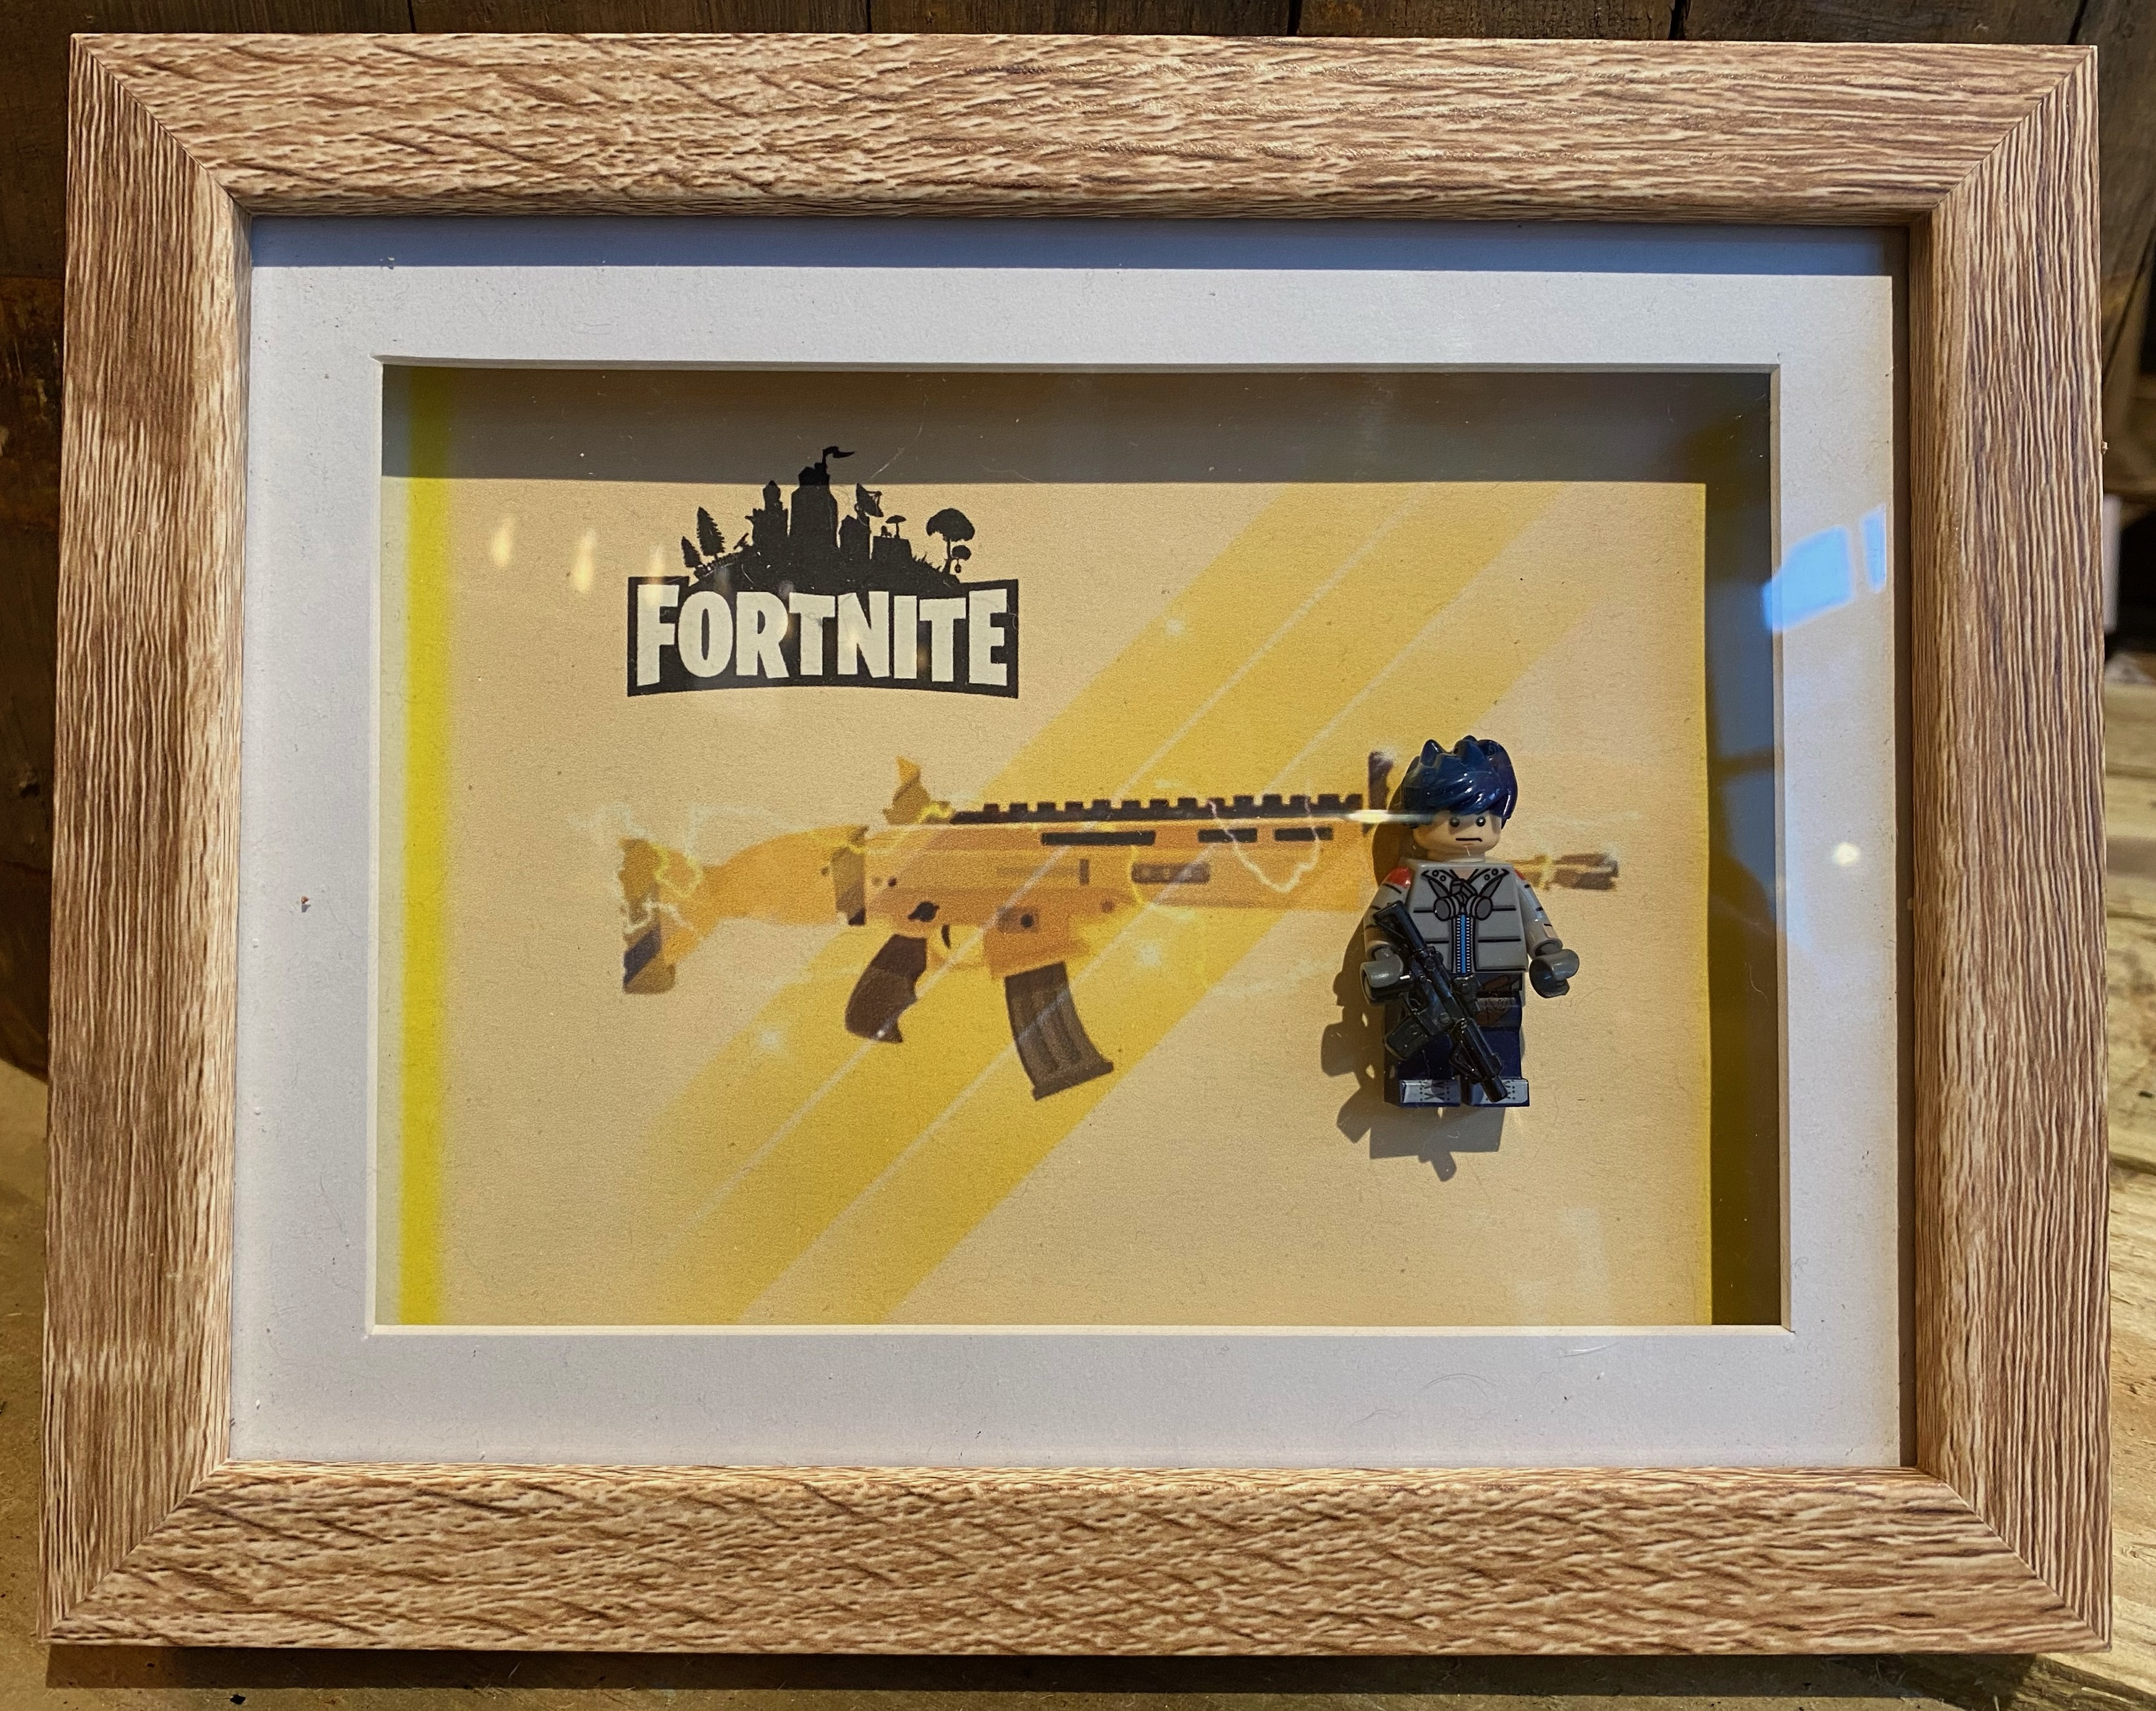 Lego Art - Fortnite